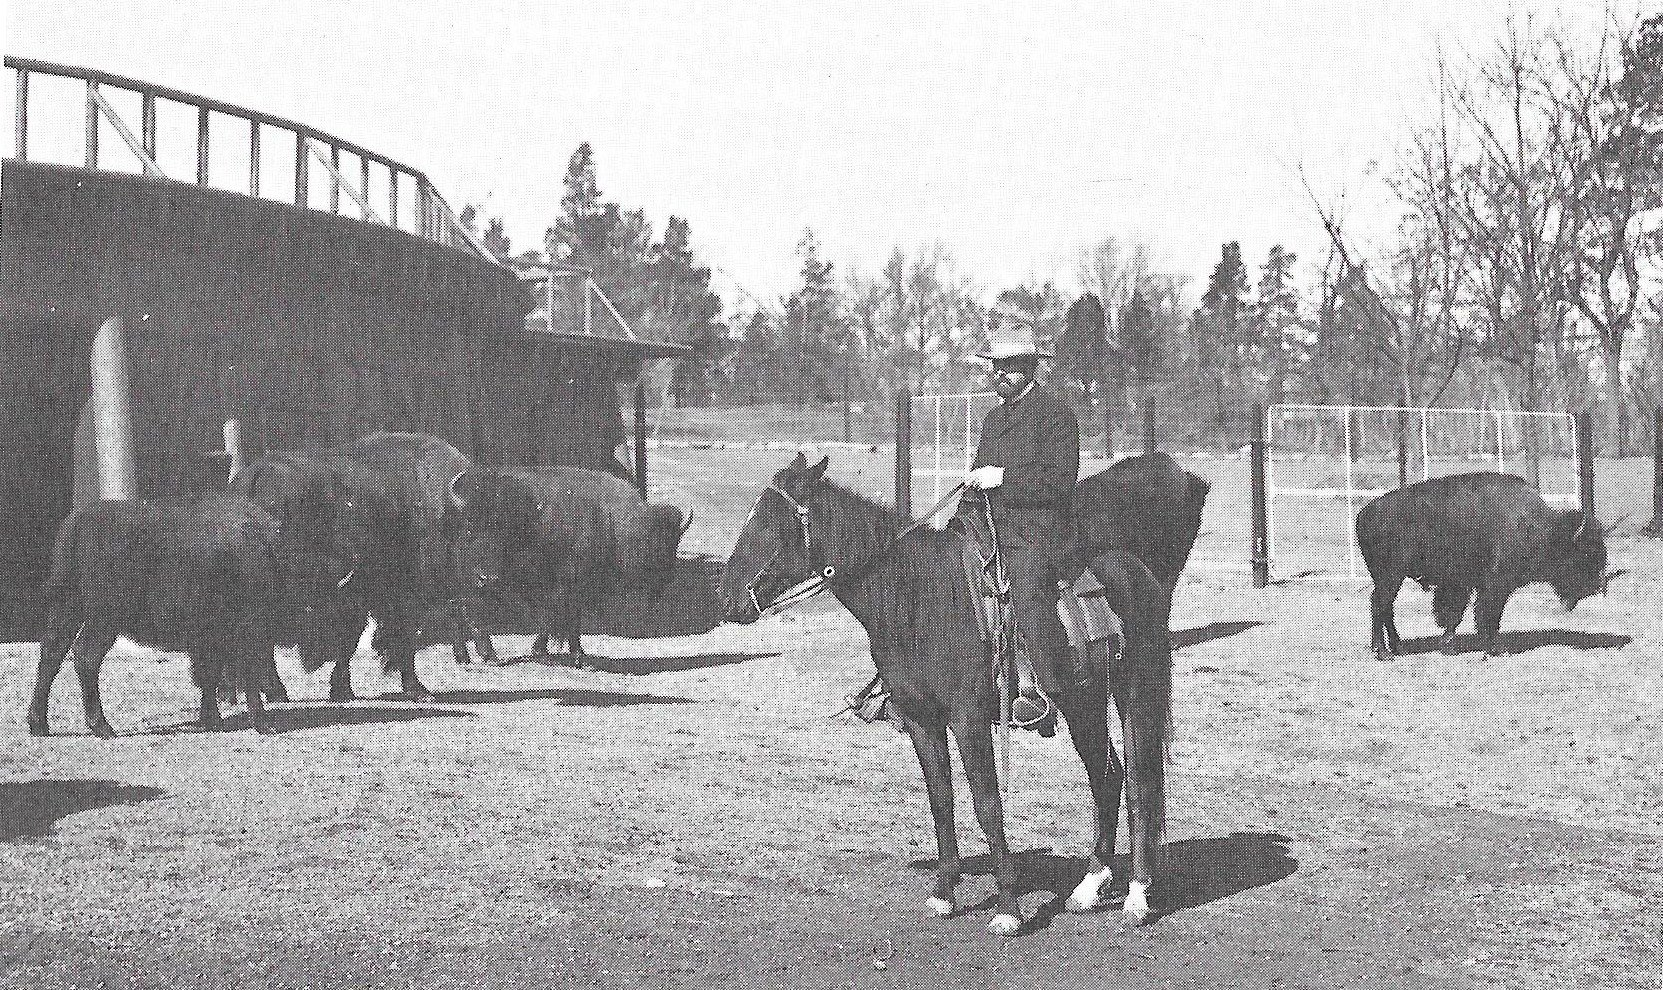 William T. Hornaday checking bison